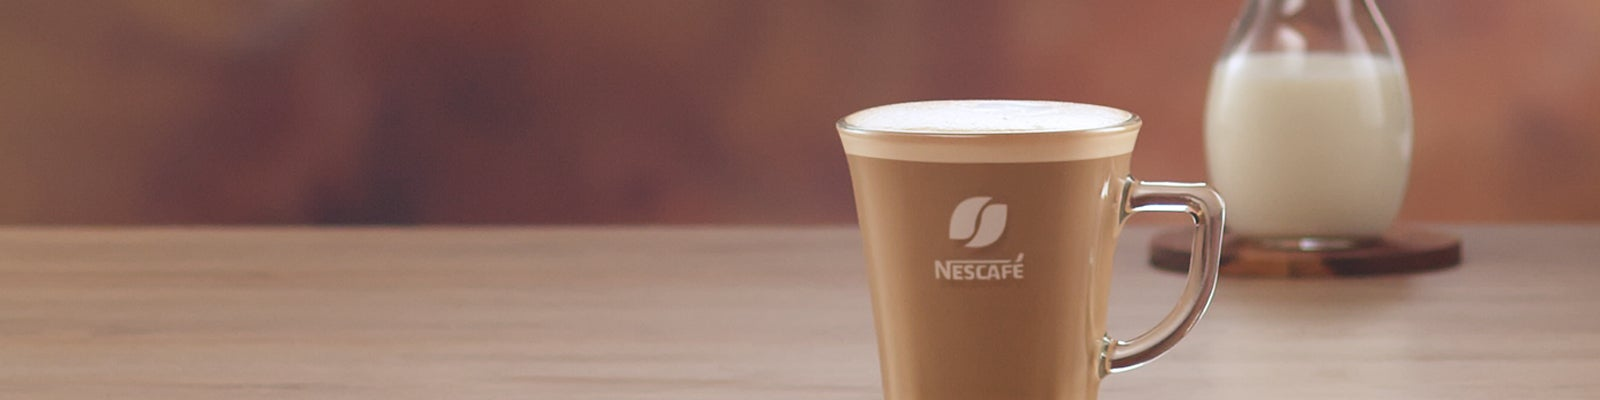 Nescafe Flat White Gold